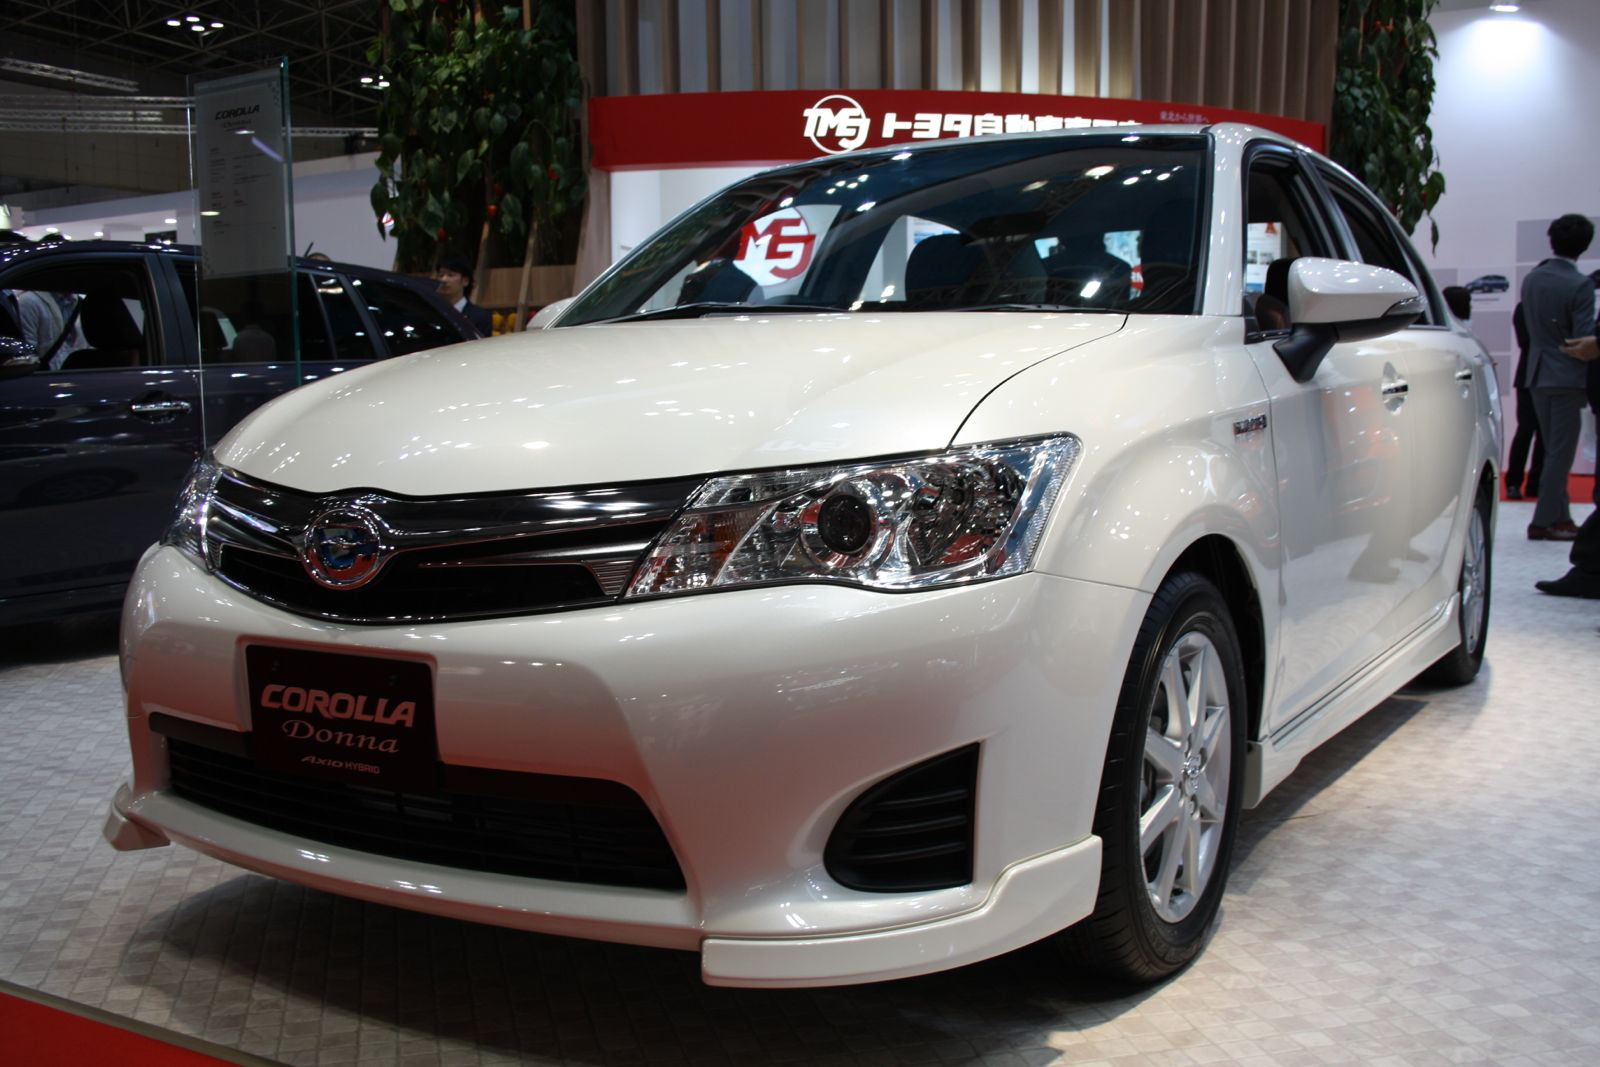 Toyota corolla axio 2013 price in pakistan review full specs images toyota corolla axio 2013 features specs voltagebd Gallery